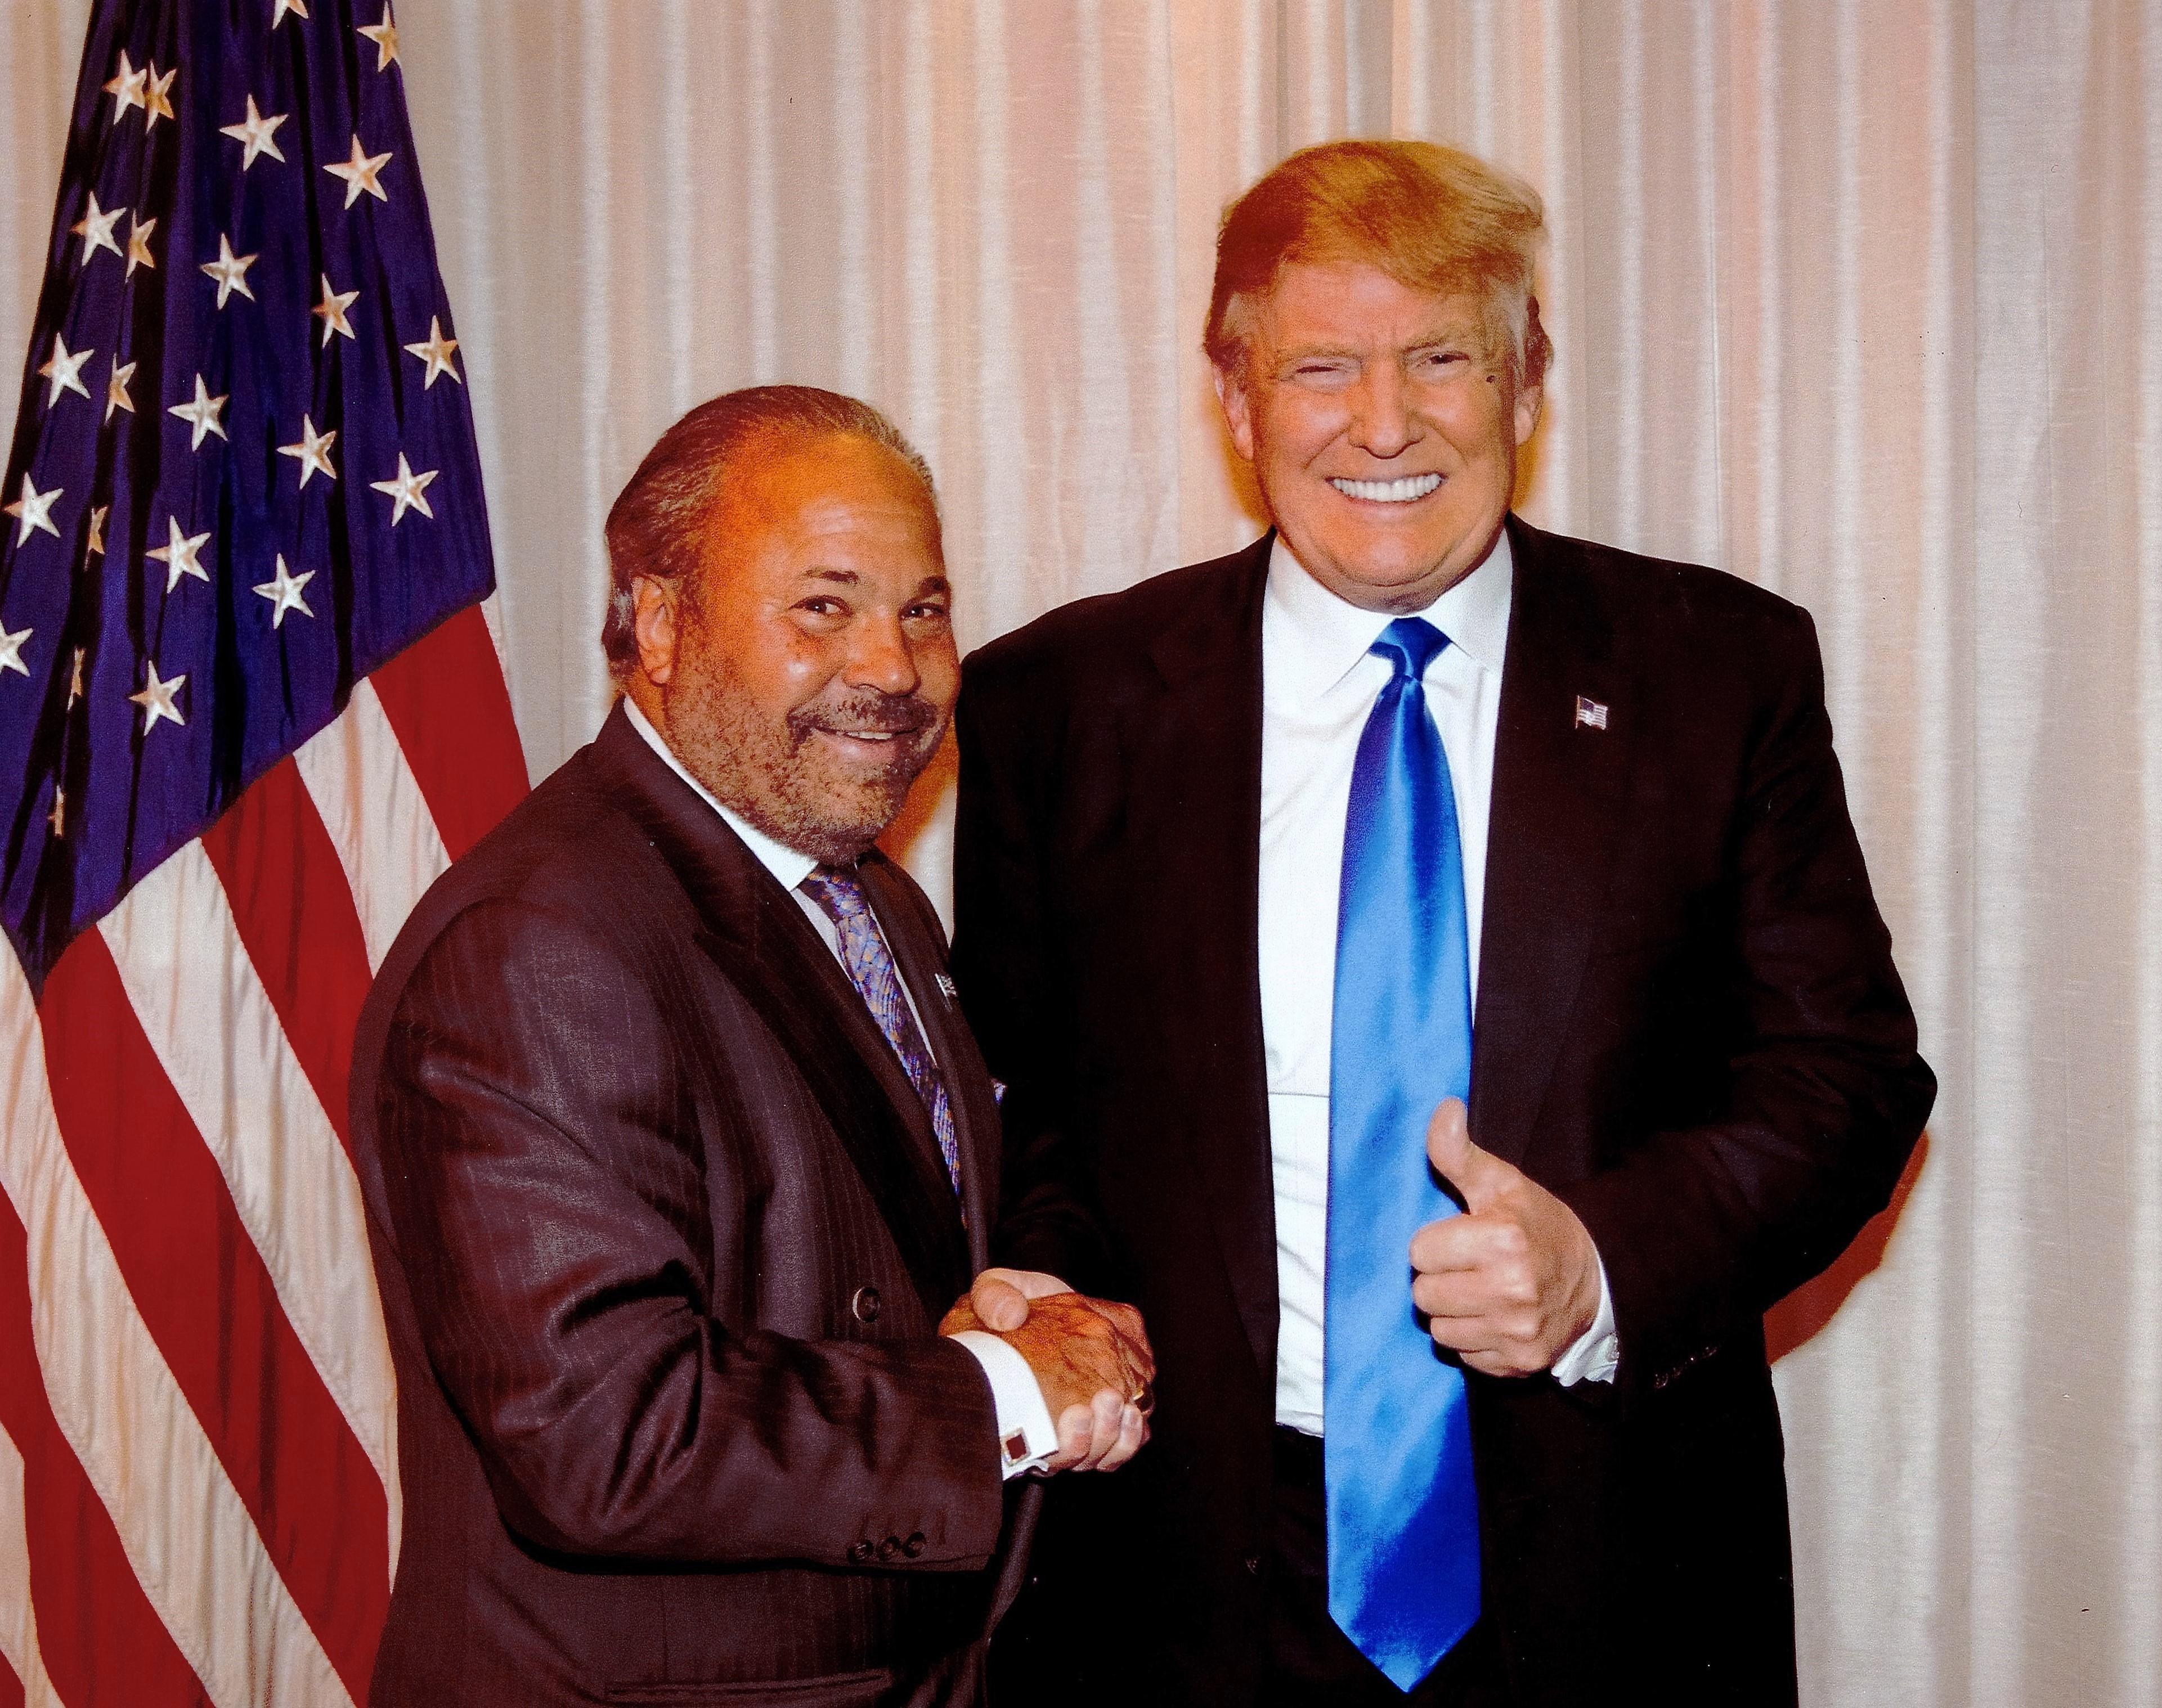 Bo and Trump 6-21-16